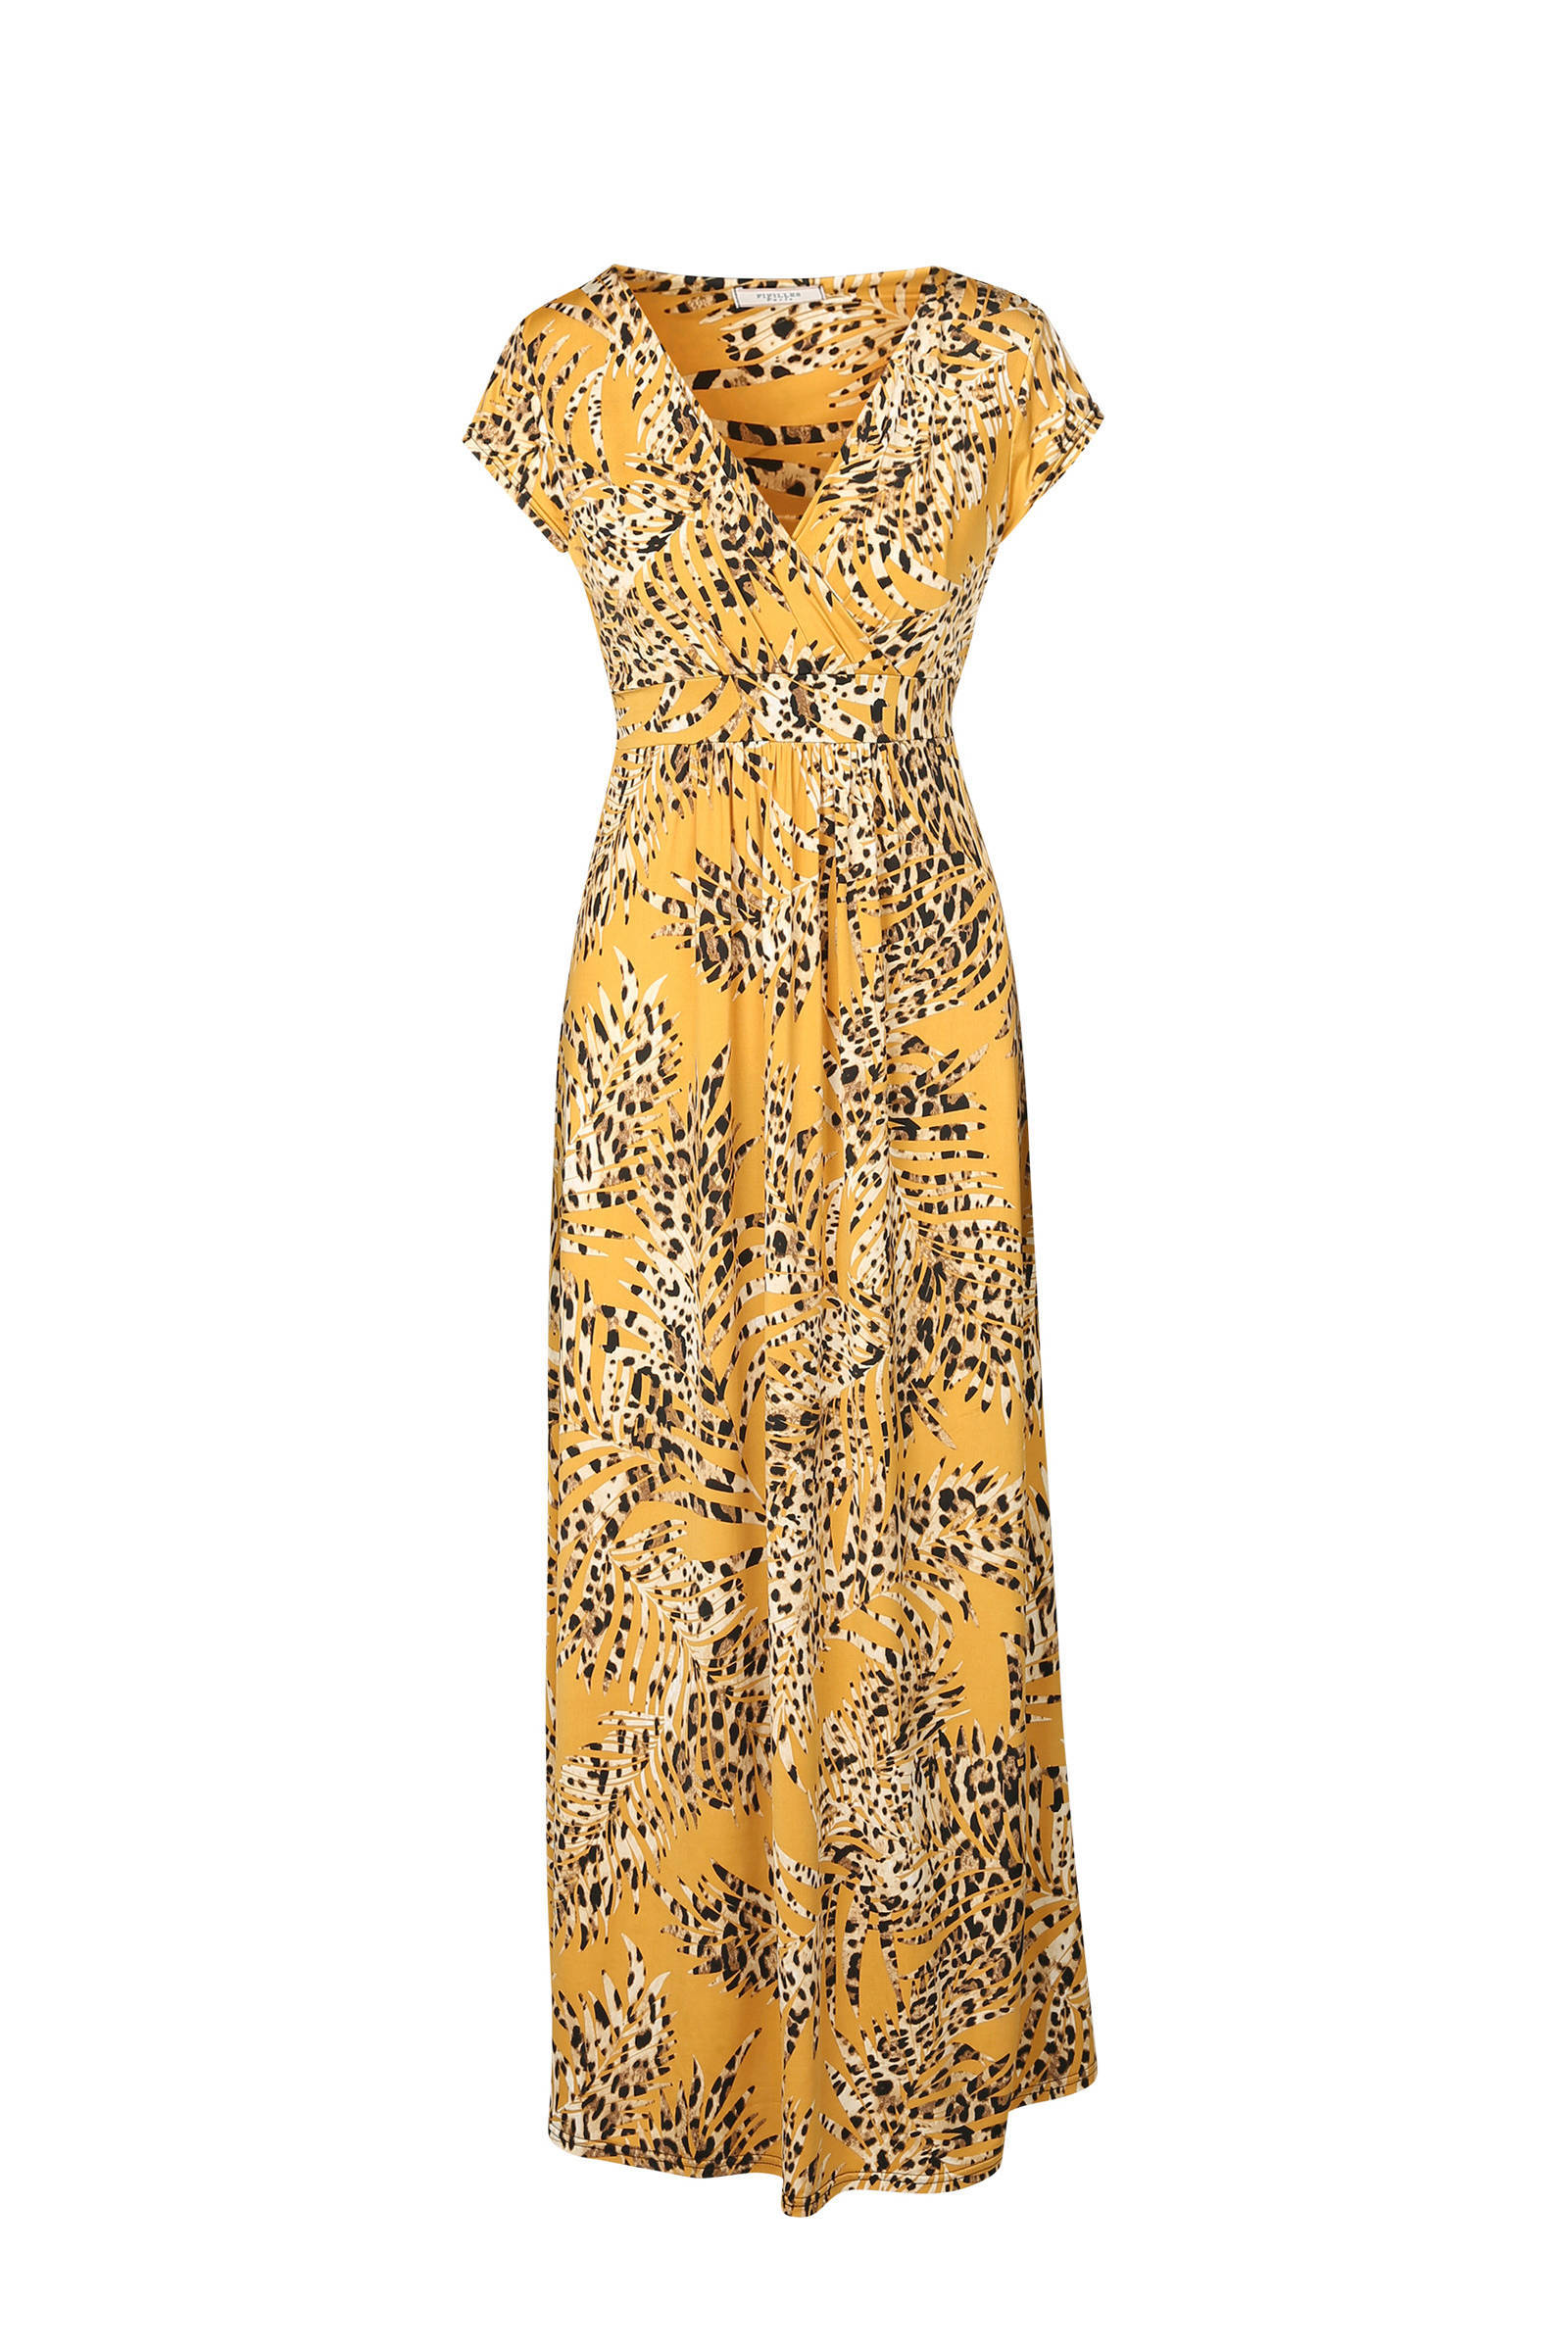 lang kleed kopen